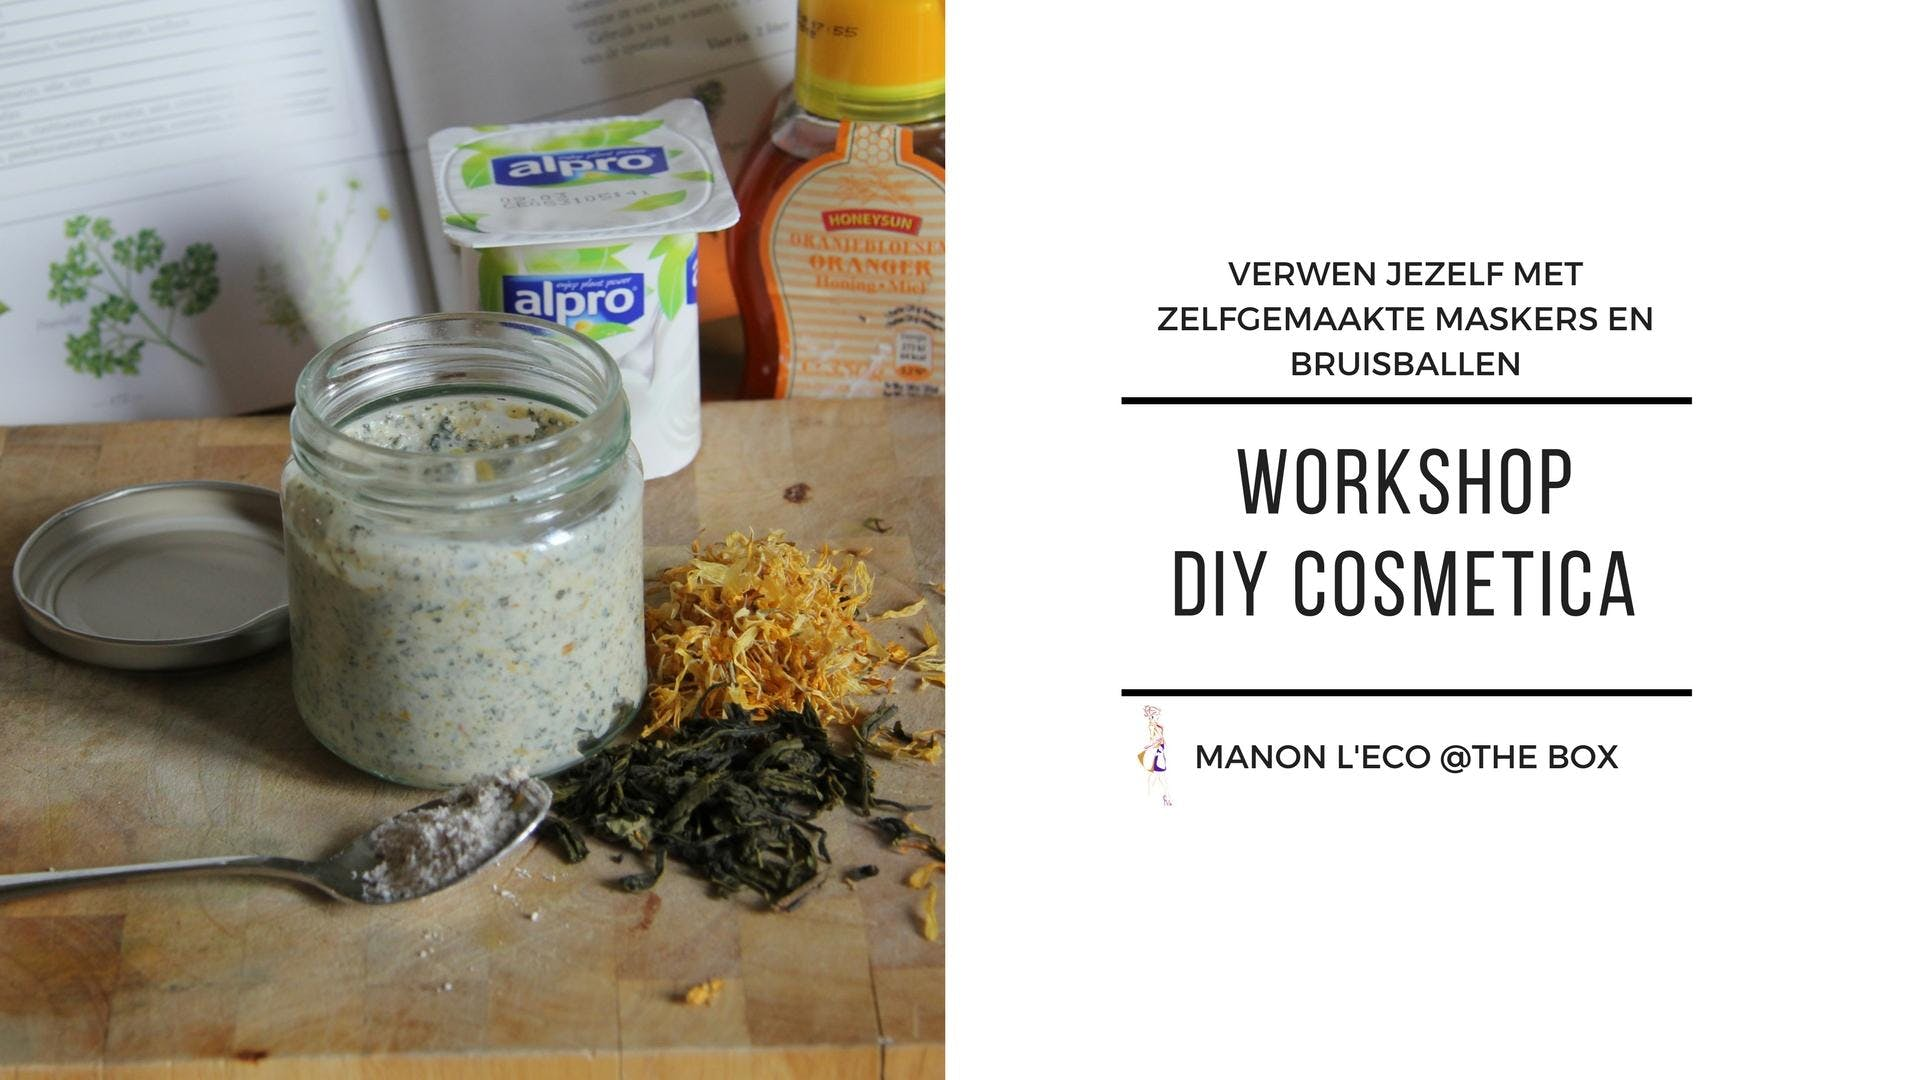 Workshop DIY Cosmetica